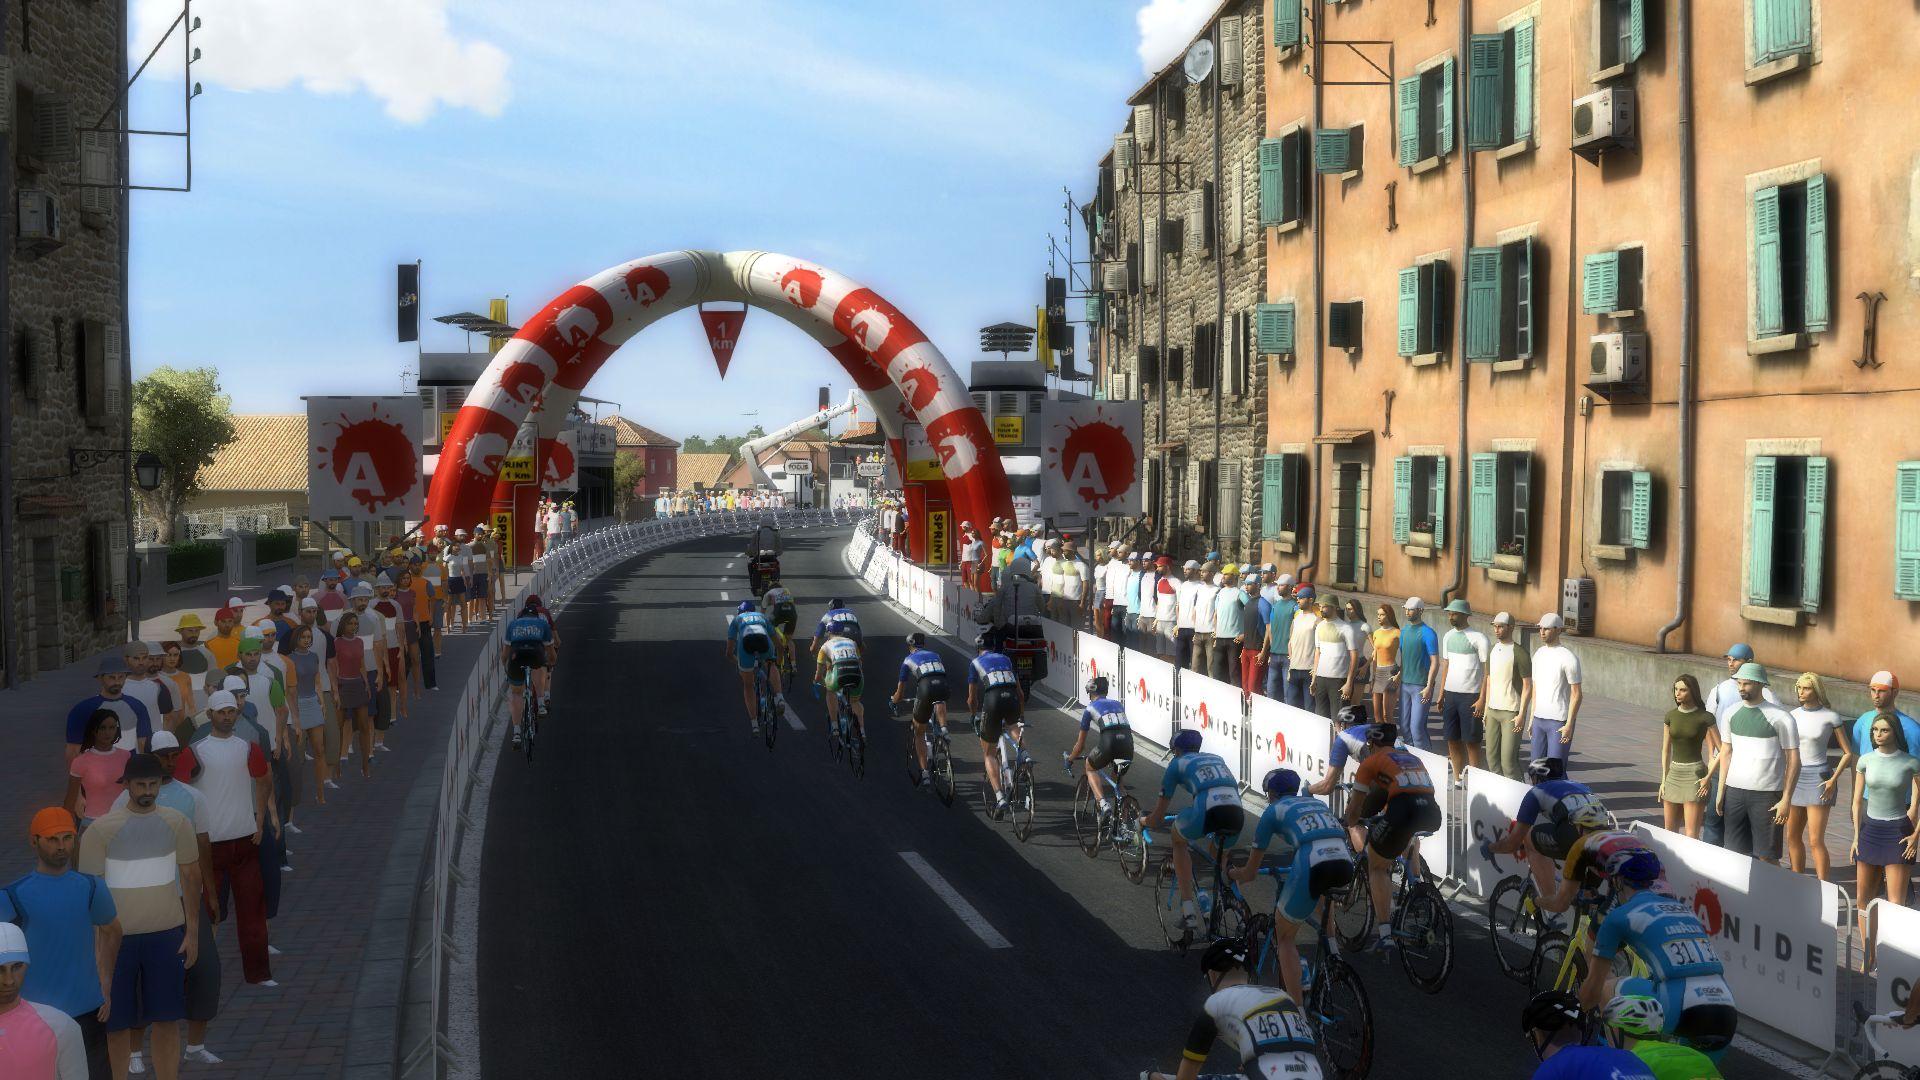 pcmdaily.com/images/mg/2019/Races/PT/Tirreno/mg19_ta_s07_17.jpg